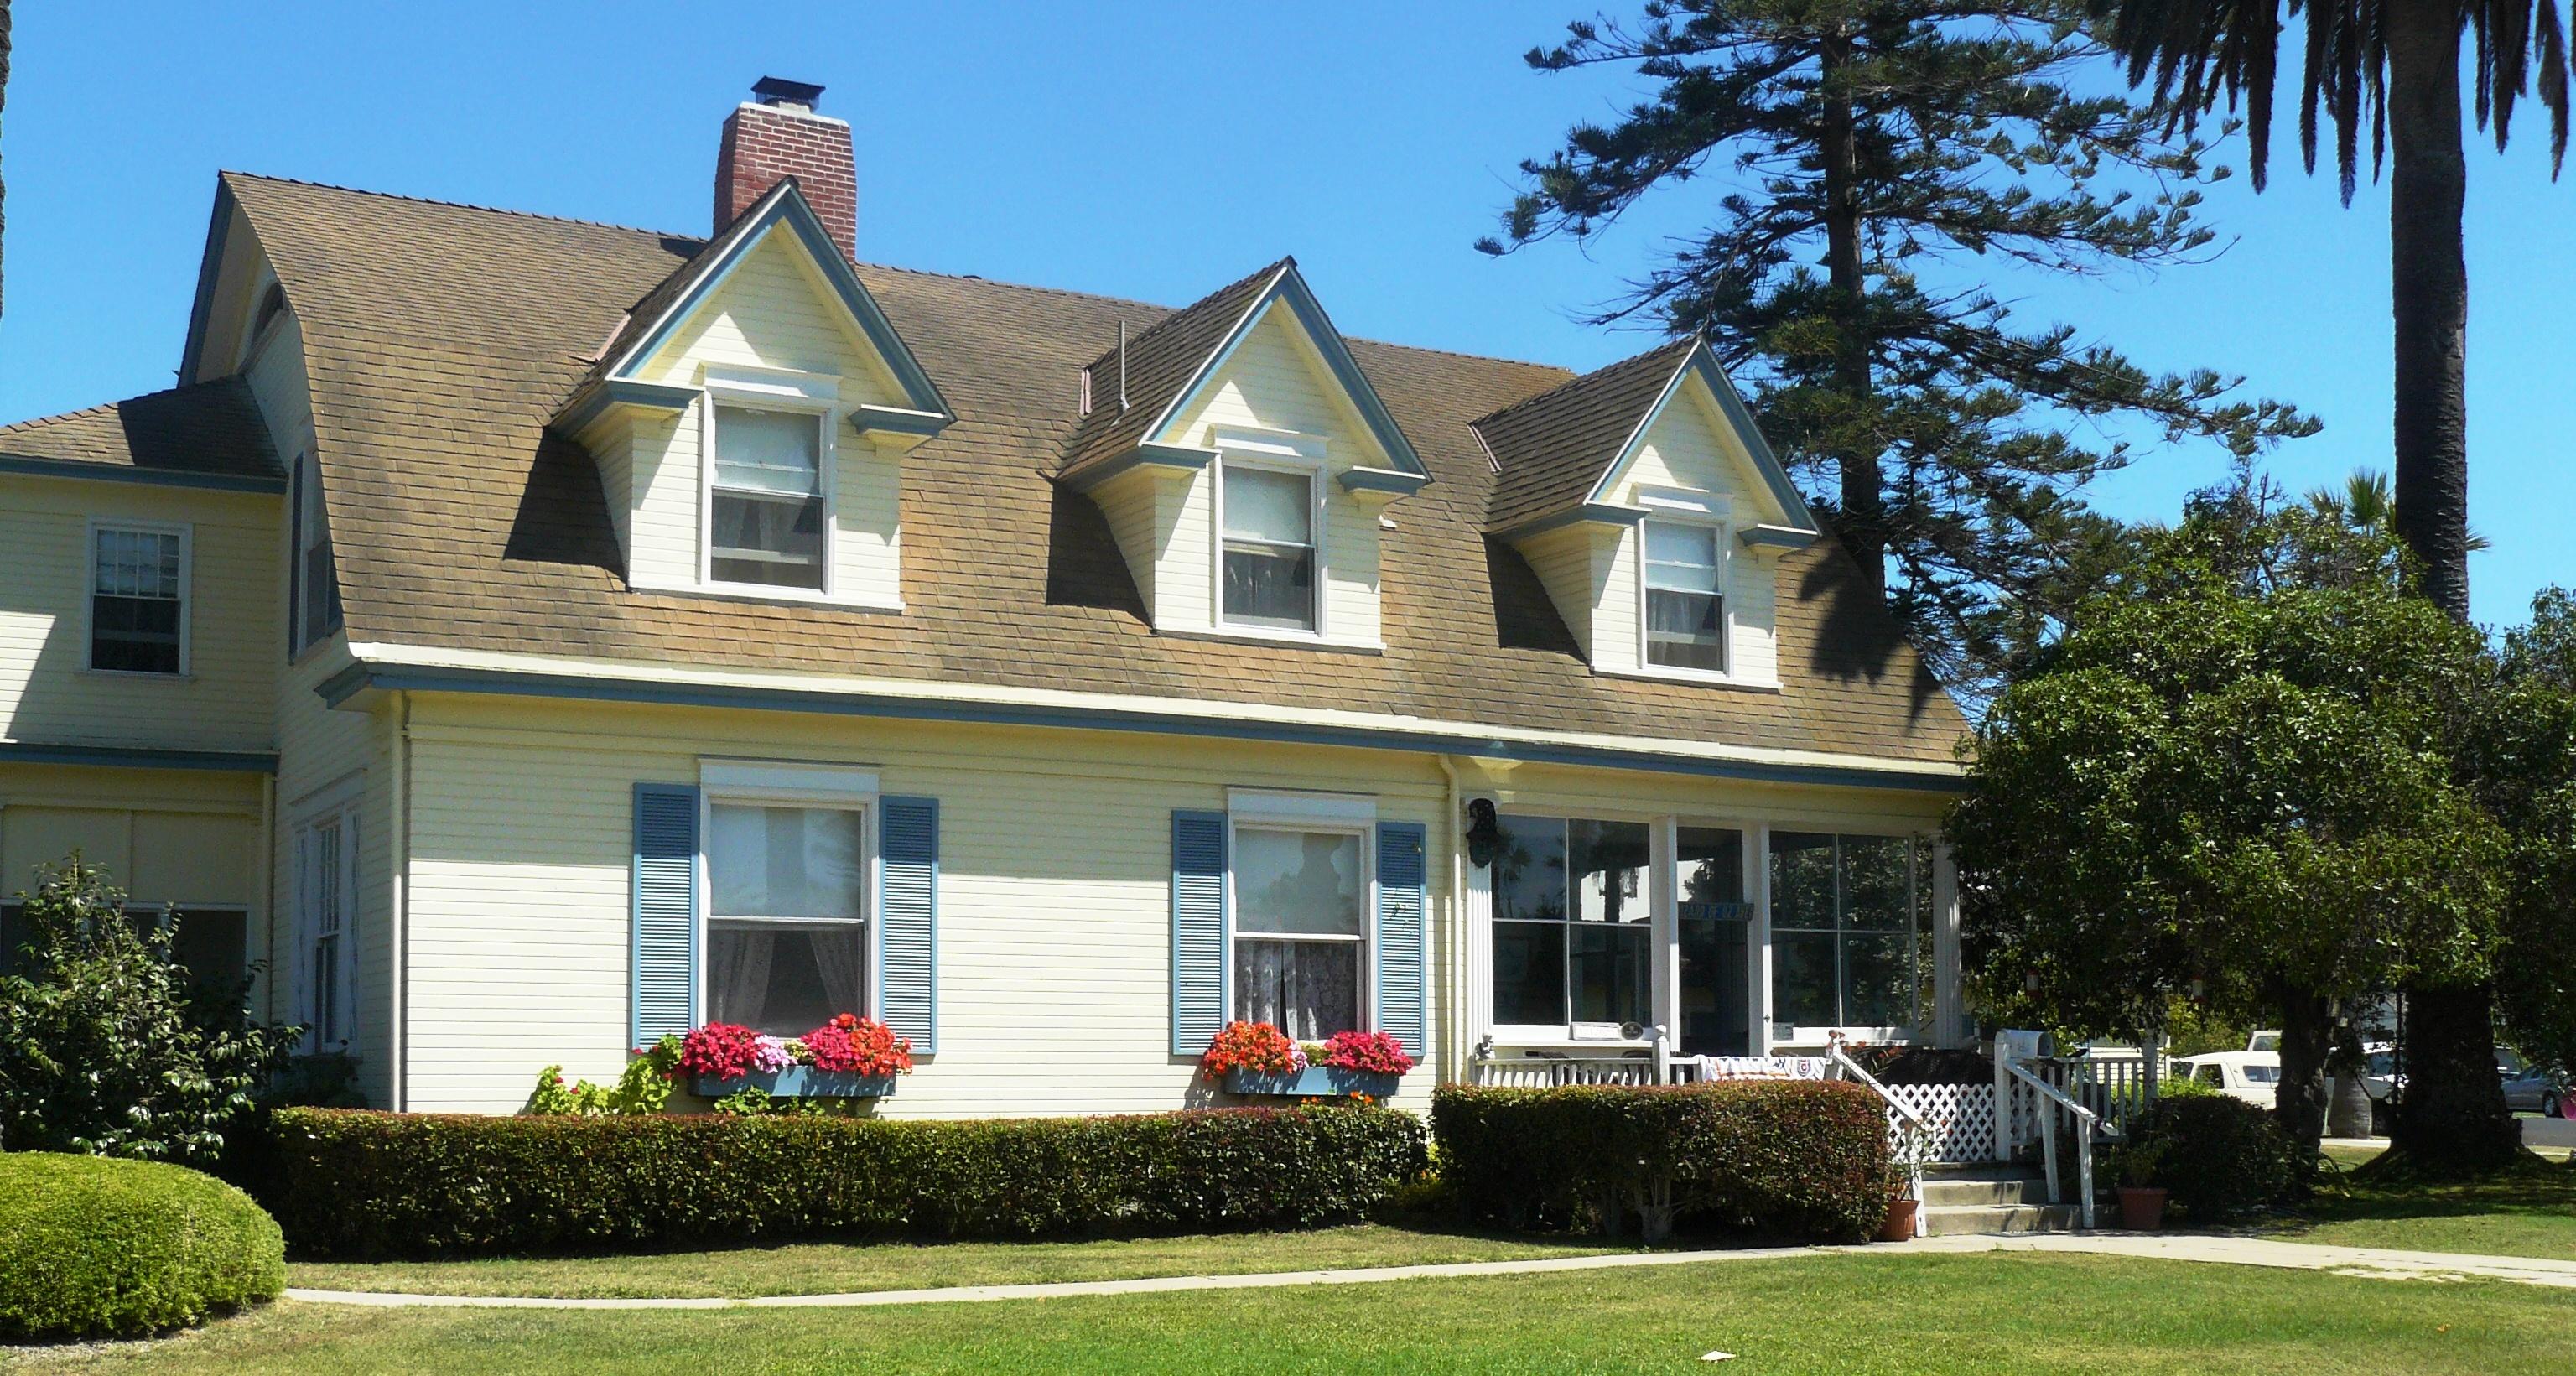 L. Frank Baum's historic Coronado home.